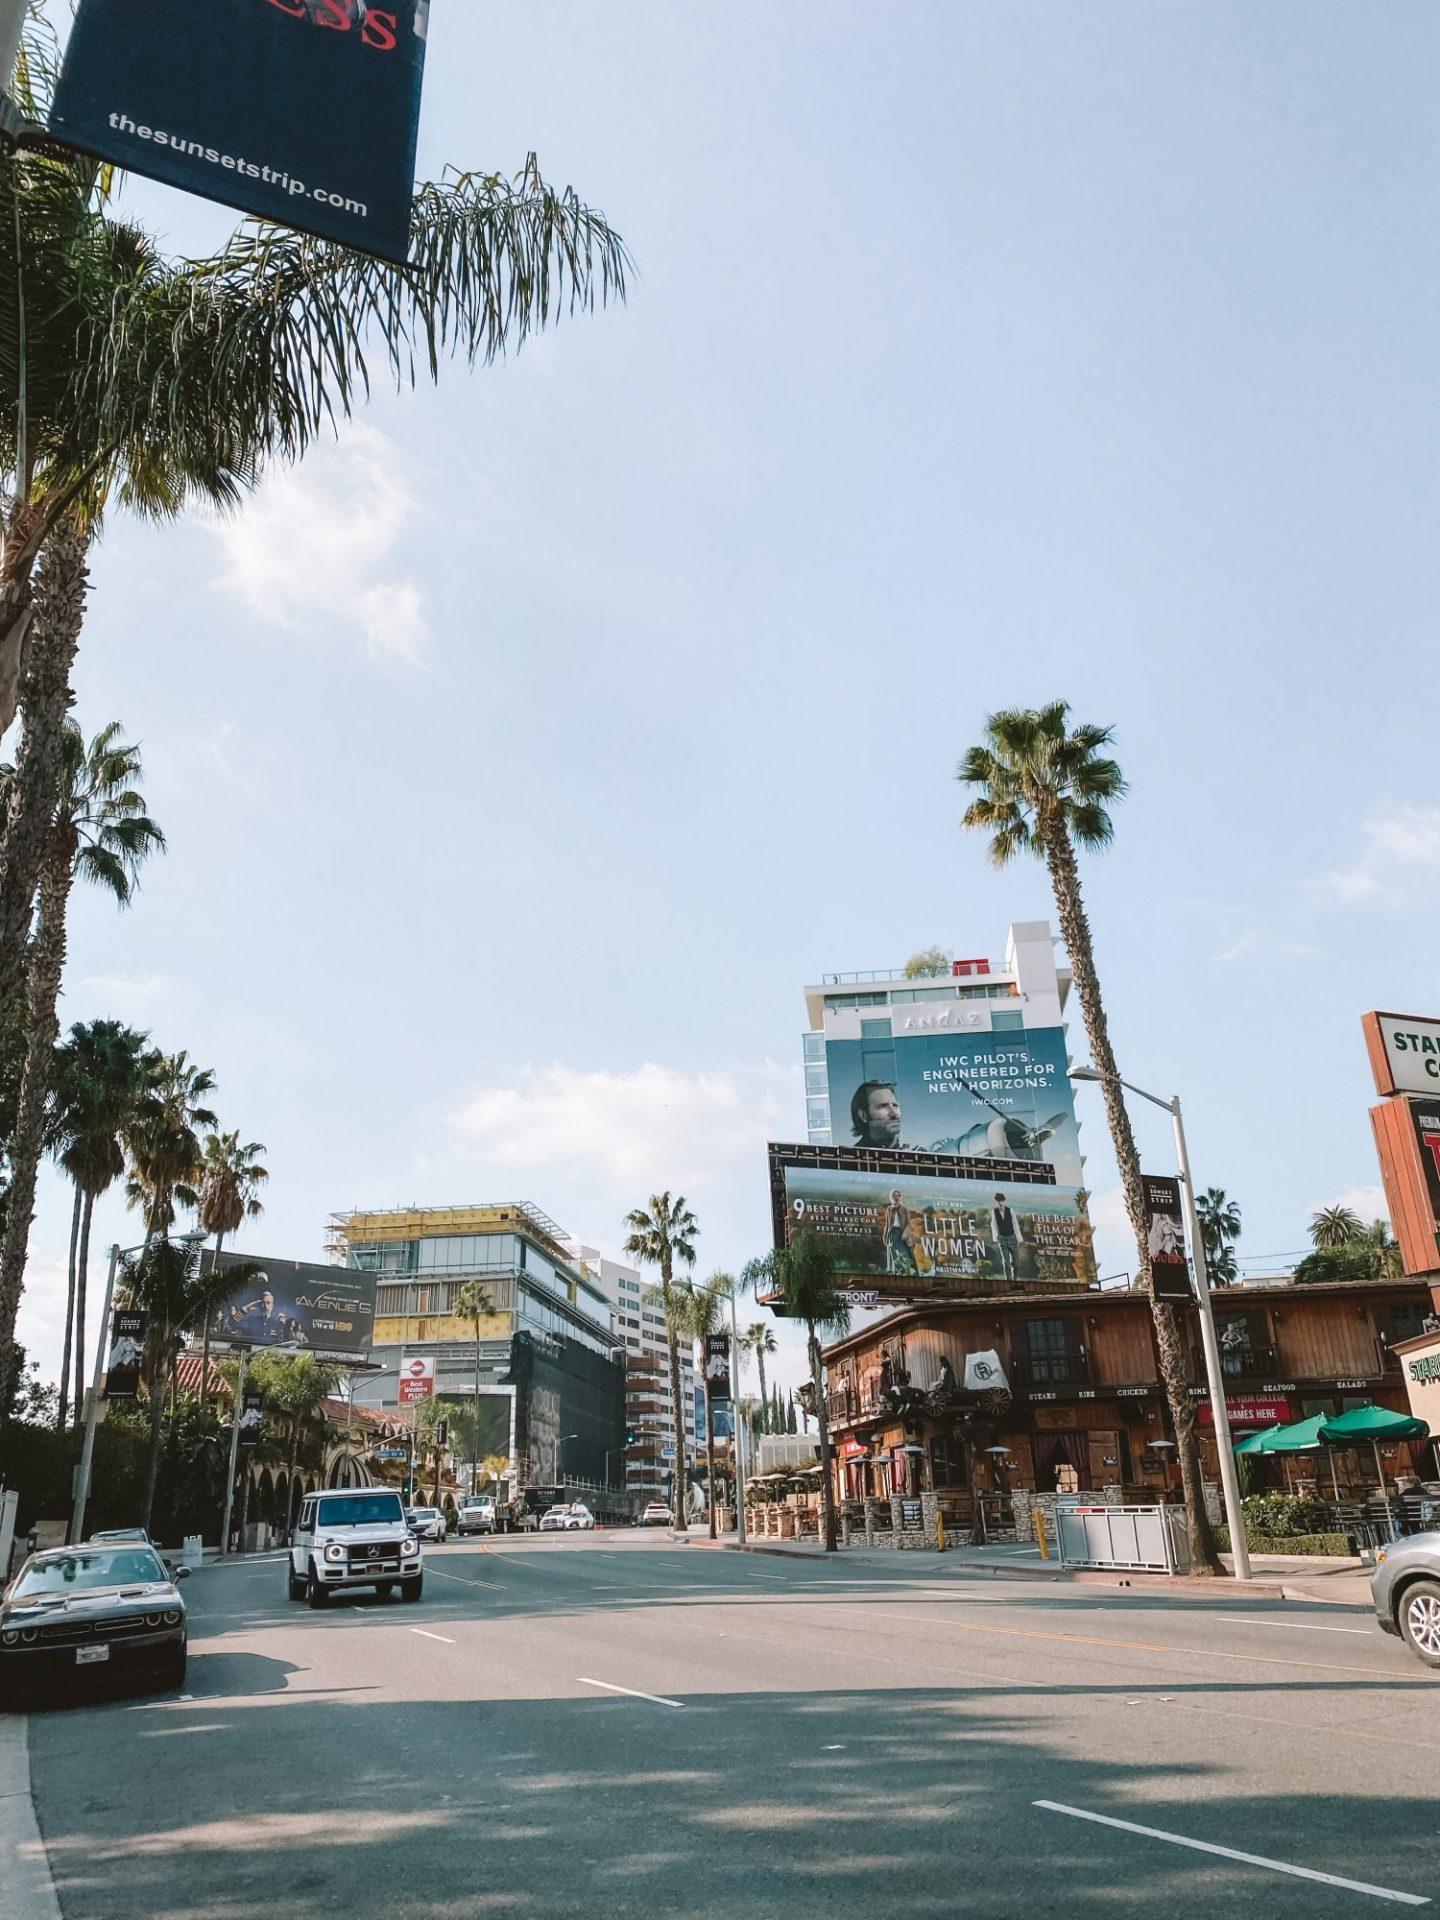 Sunset Boulevard - Blondie Baby blog voyages